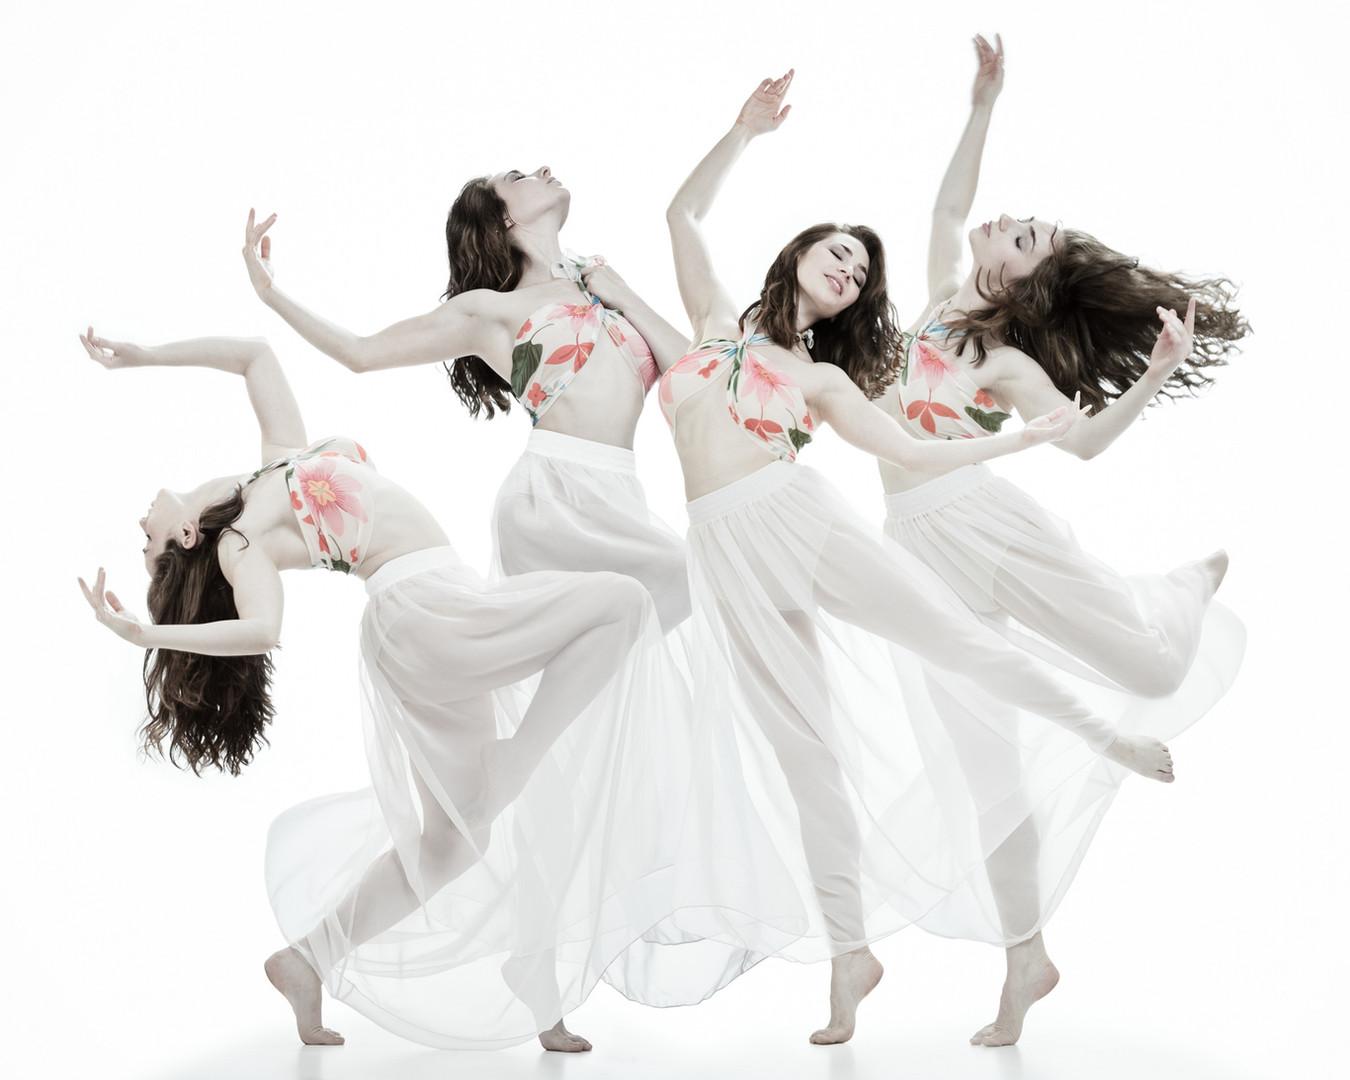 joe 4 ballet poses.jpg